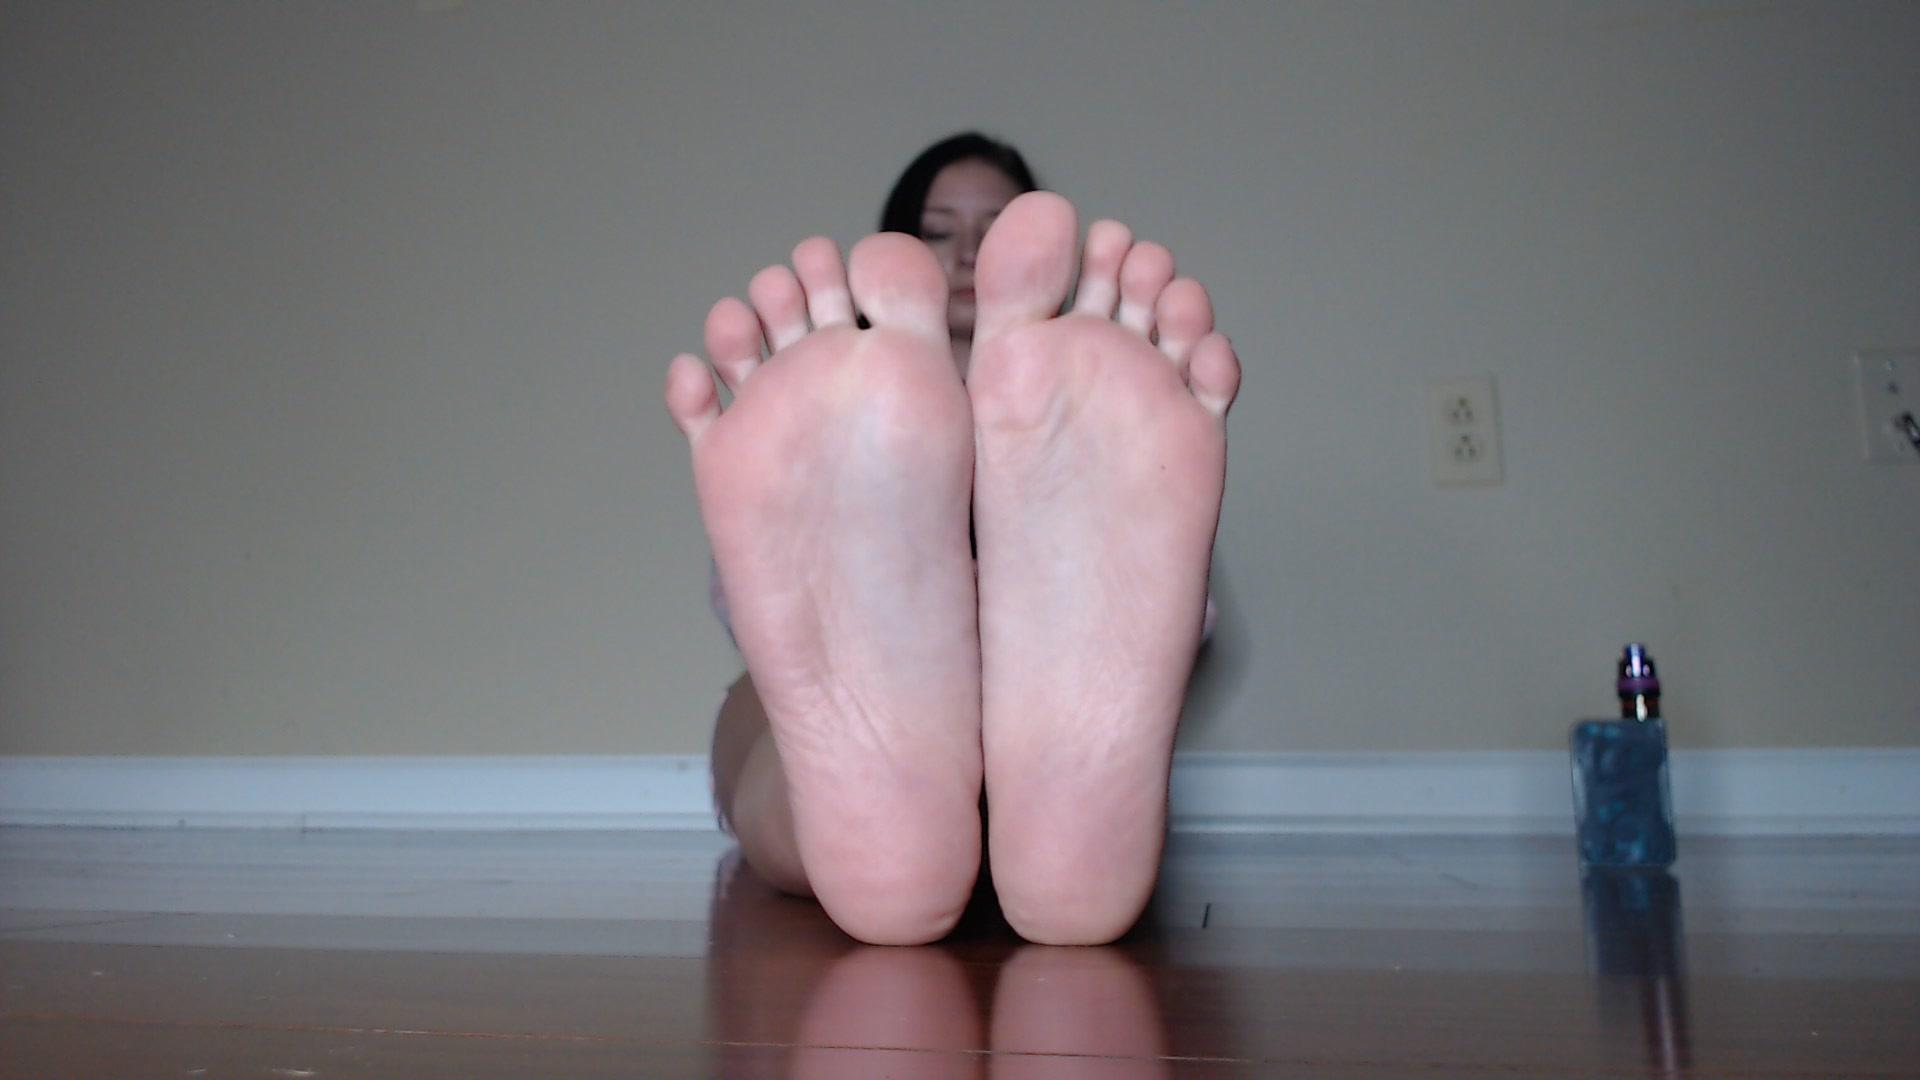 Sara lumholdt's feet wikifeet